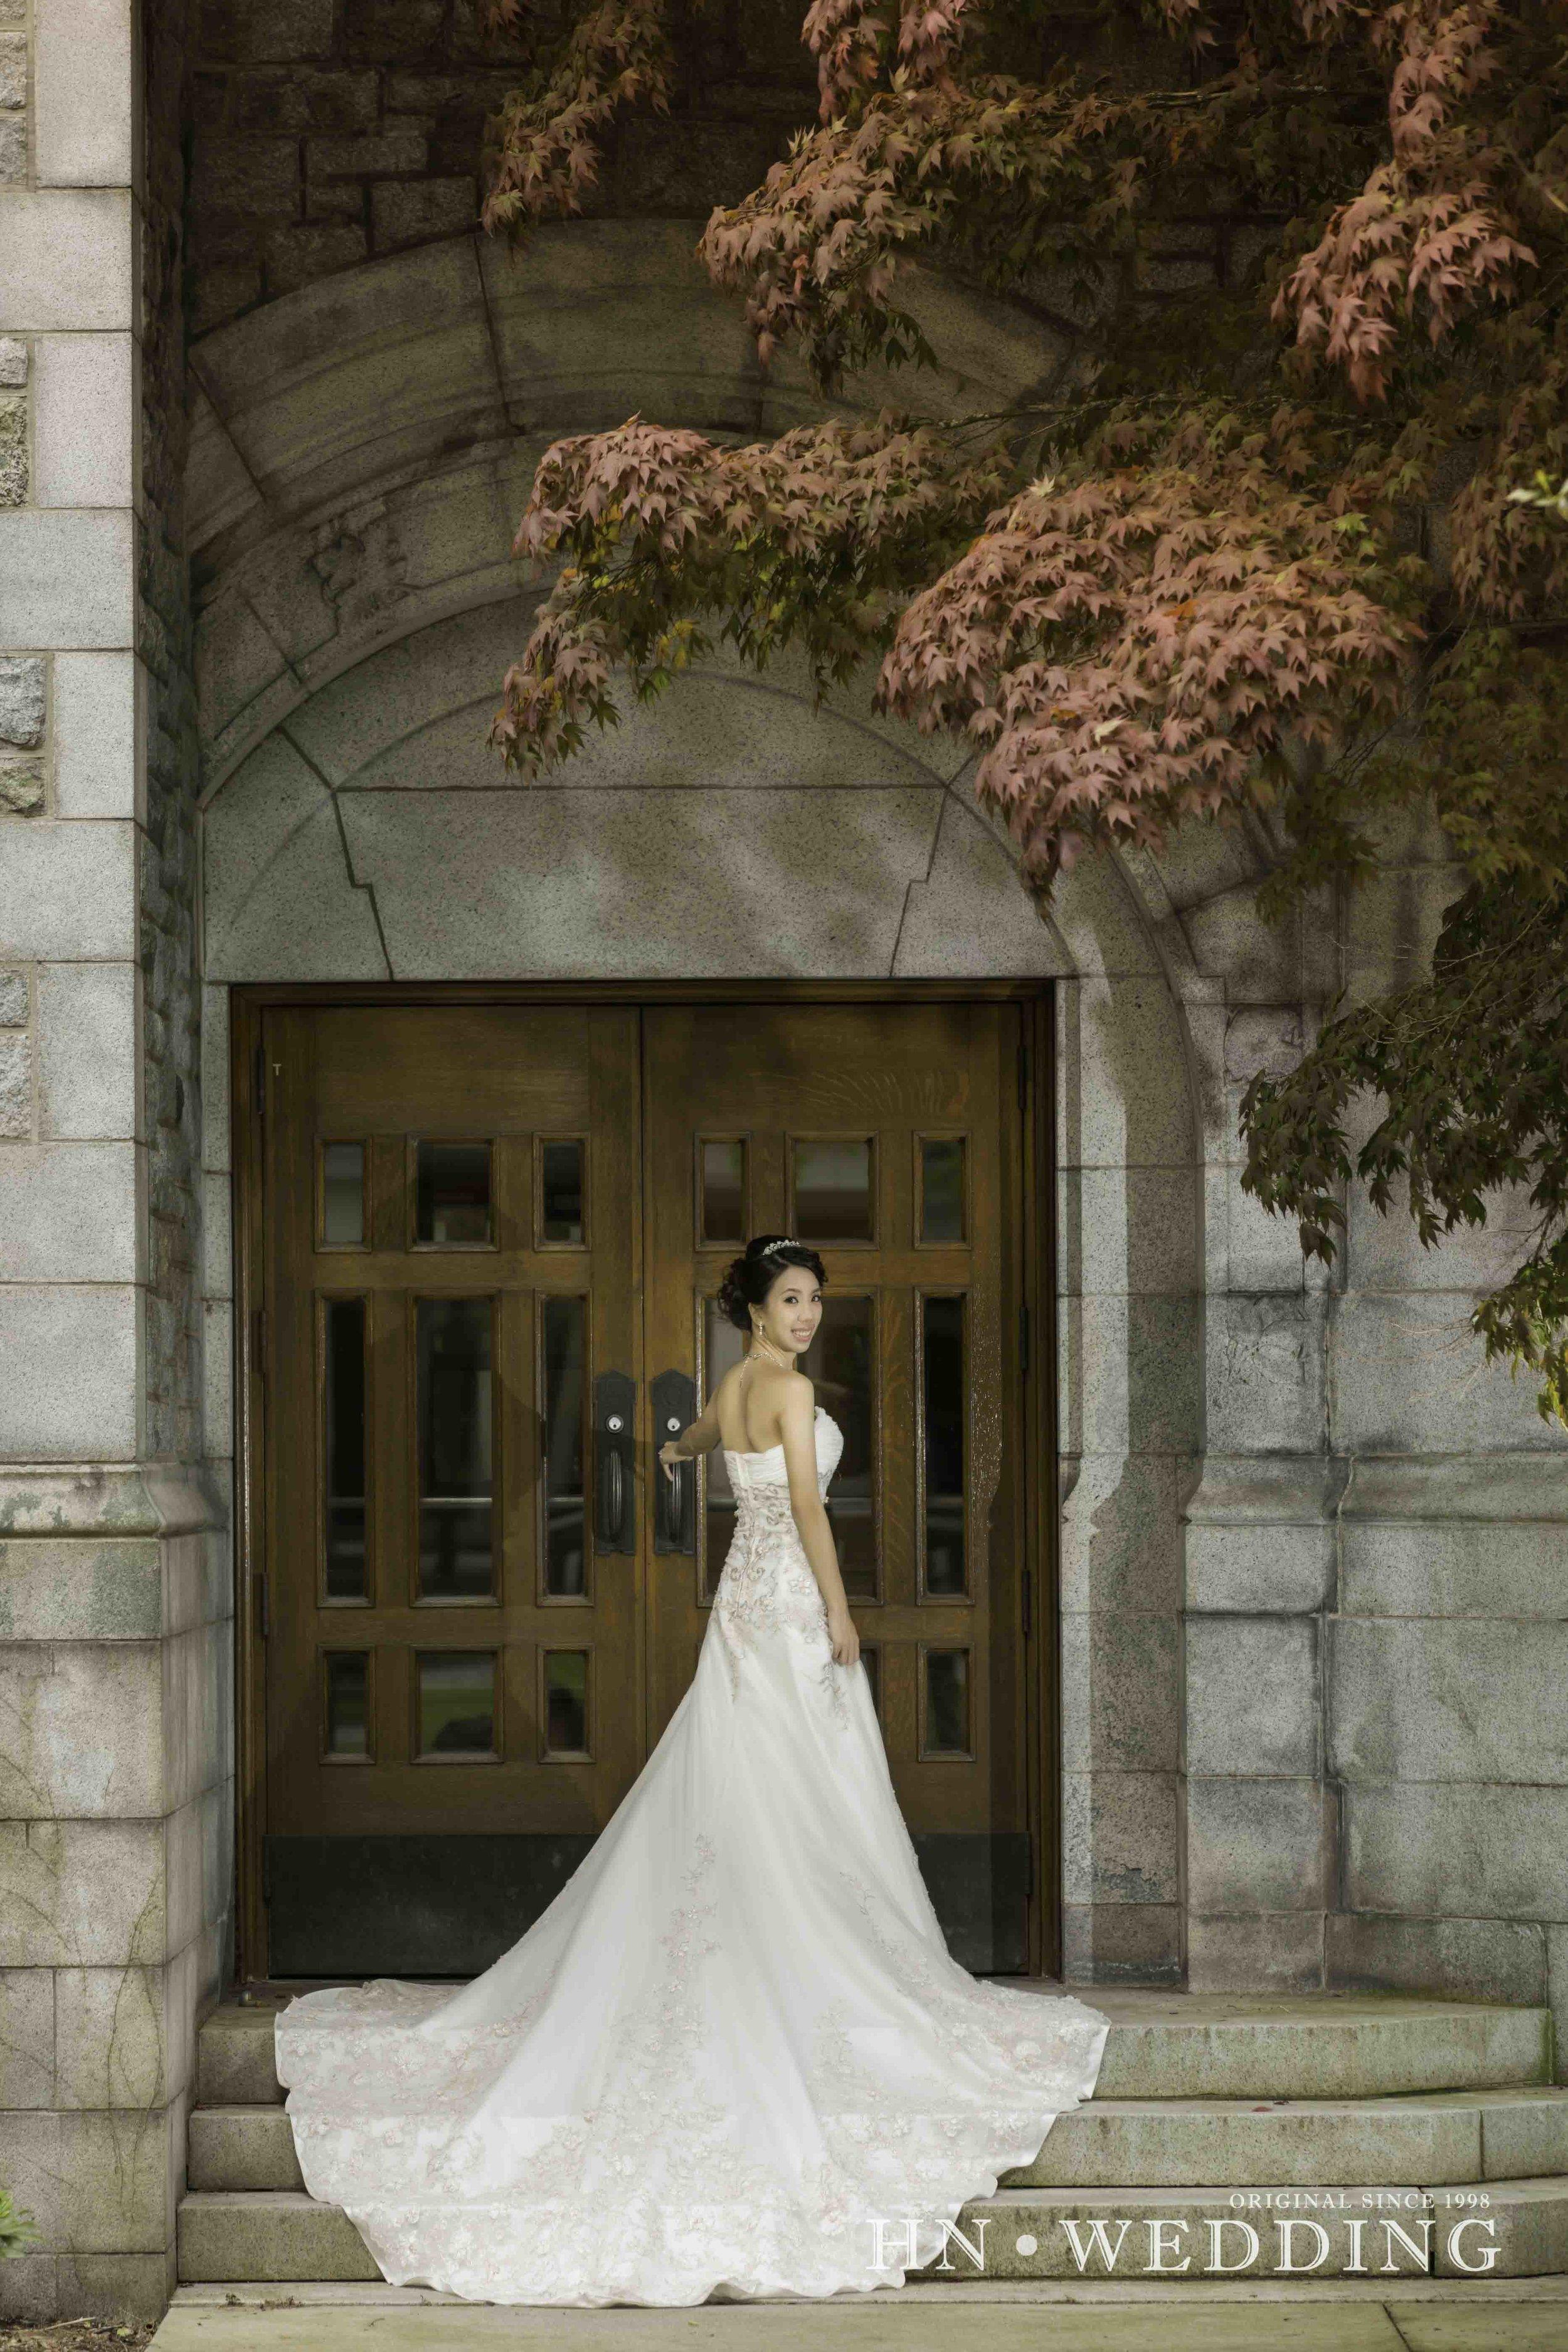 HNwedding-20170602-prewedding-9866.jpg